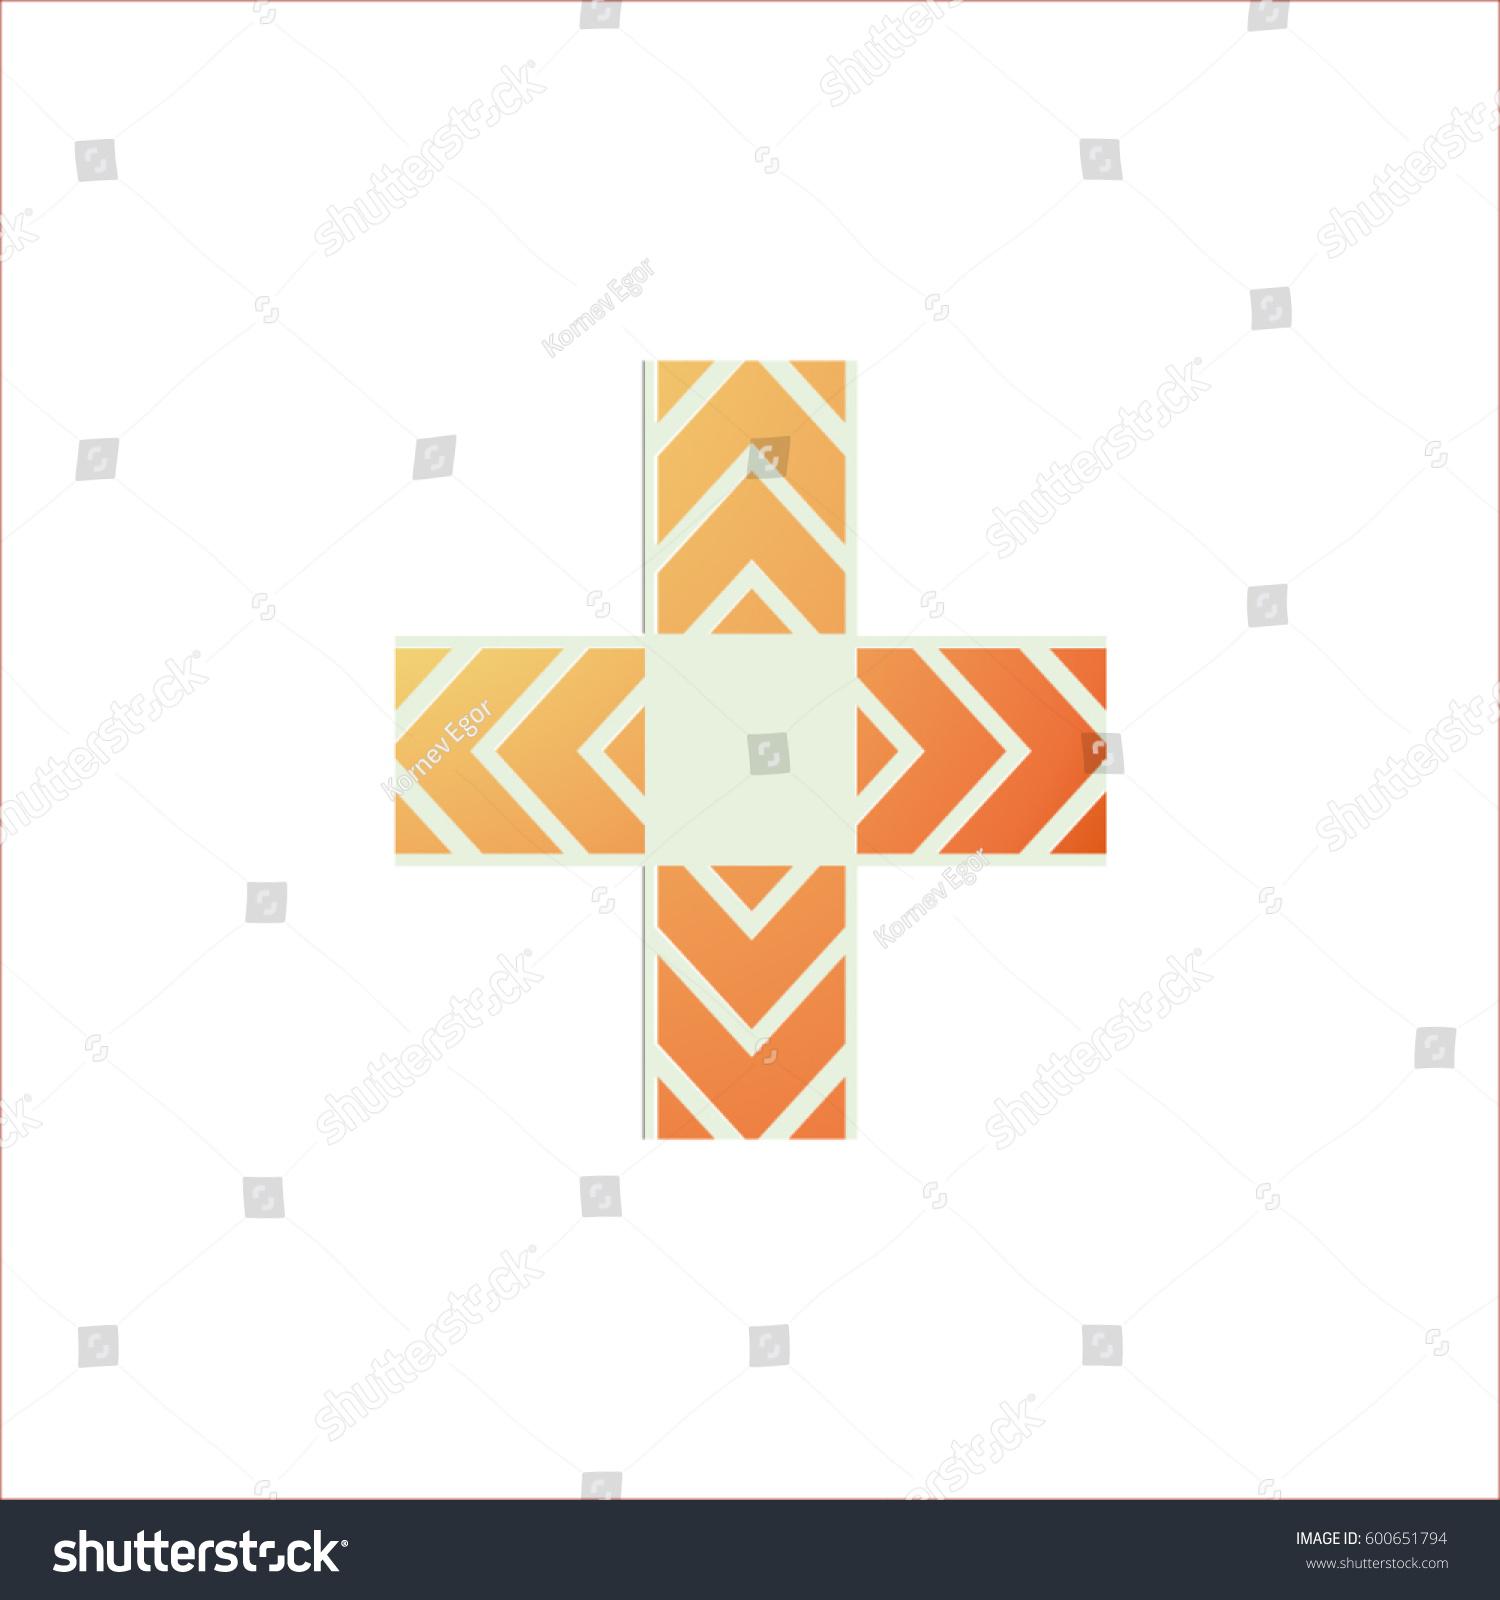 Redorange cross wavy lines empty square stock vector 600651794 red orange cross with wavy lines and an empty square in the center of the buycottarizona Gallery